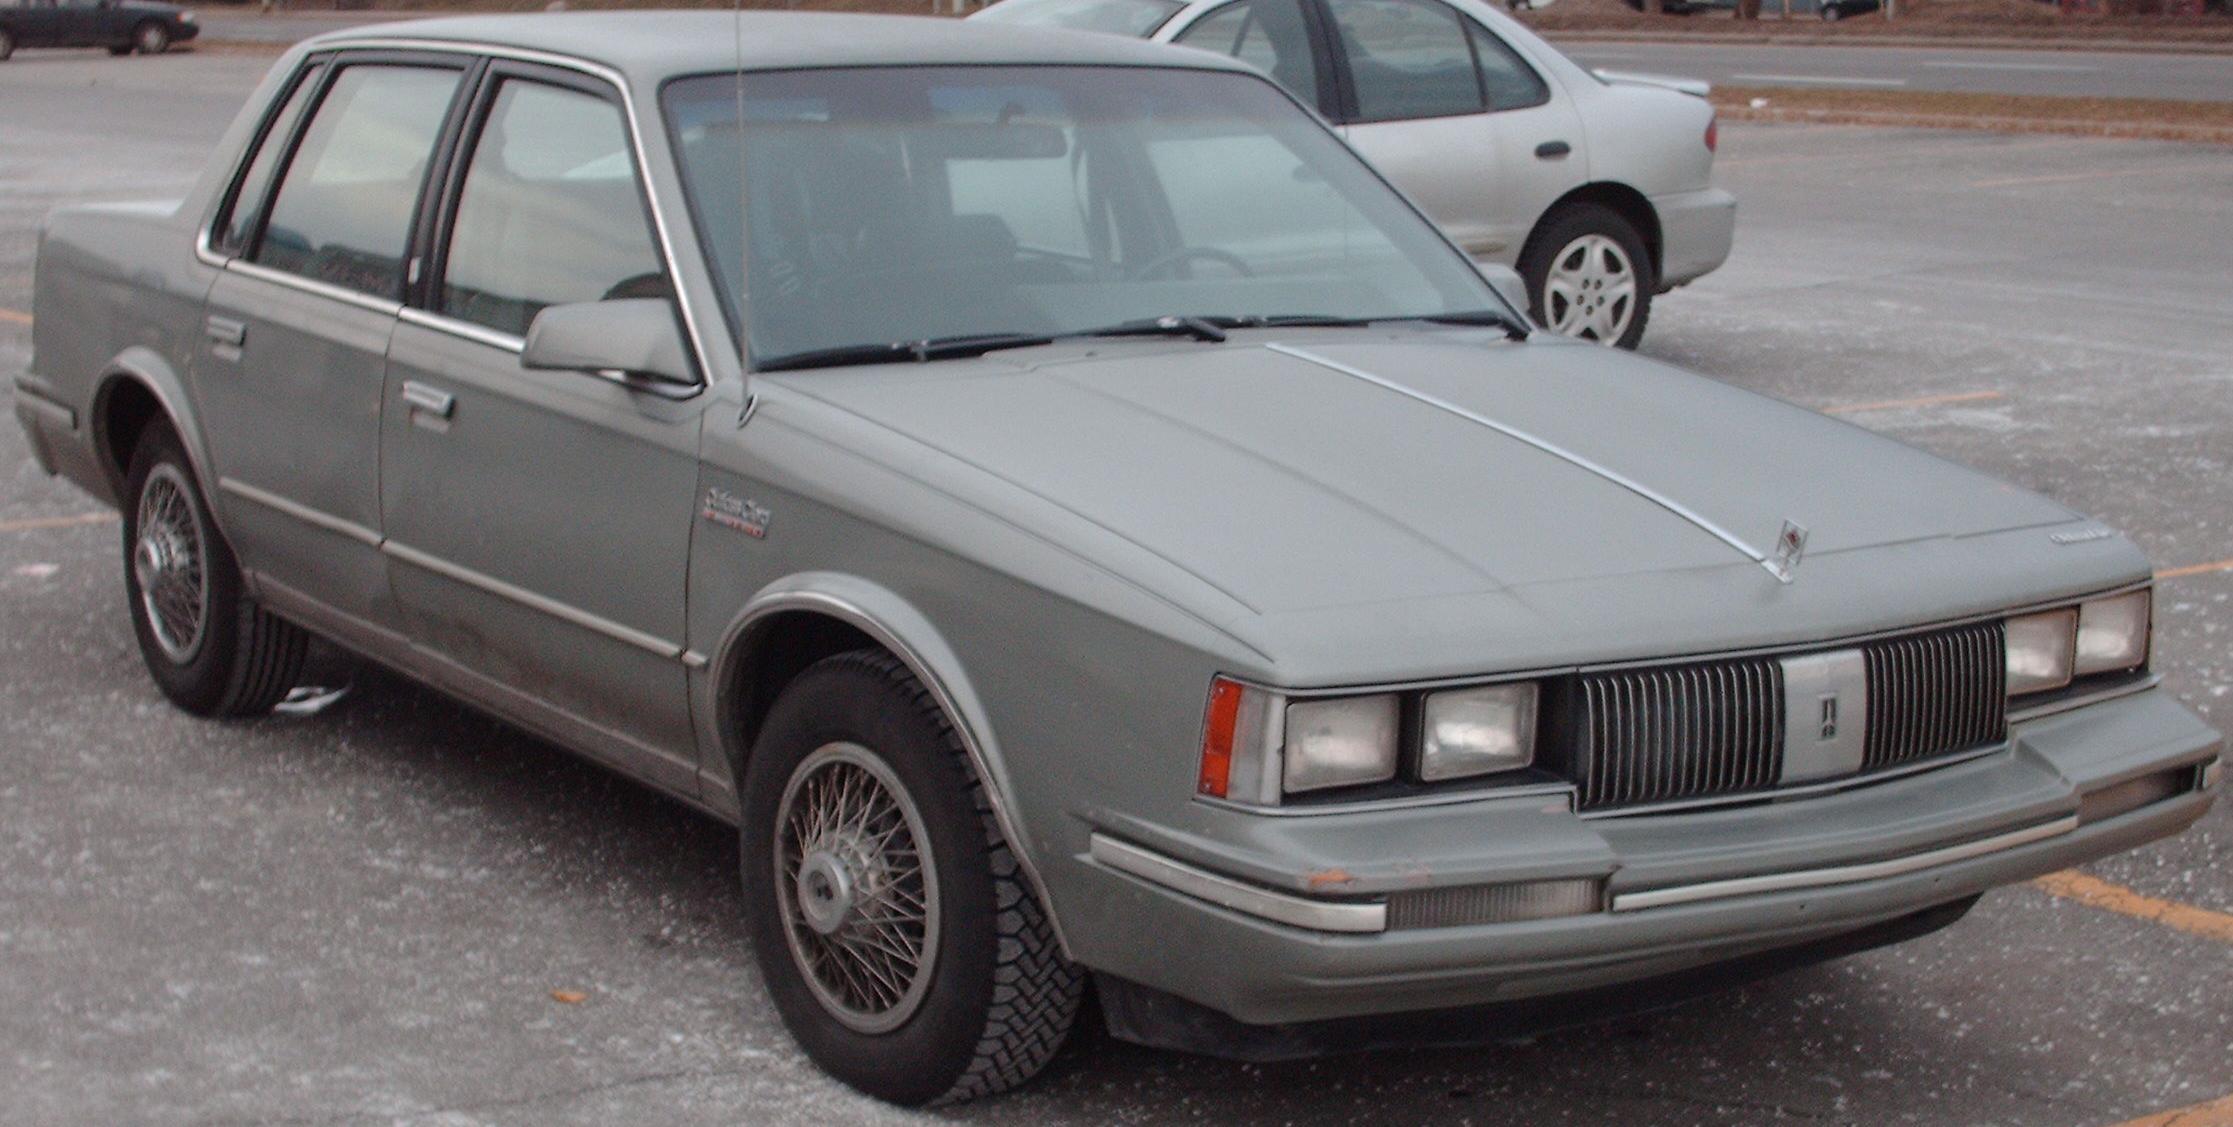 Oldsmobile Cutlass Ciera 1981 - 1996 Coupe #6